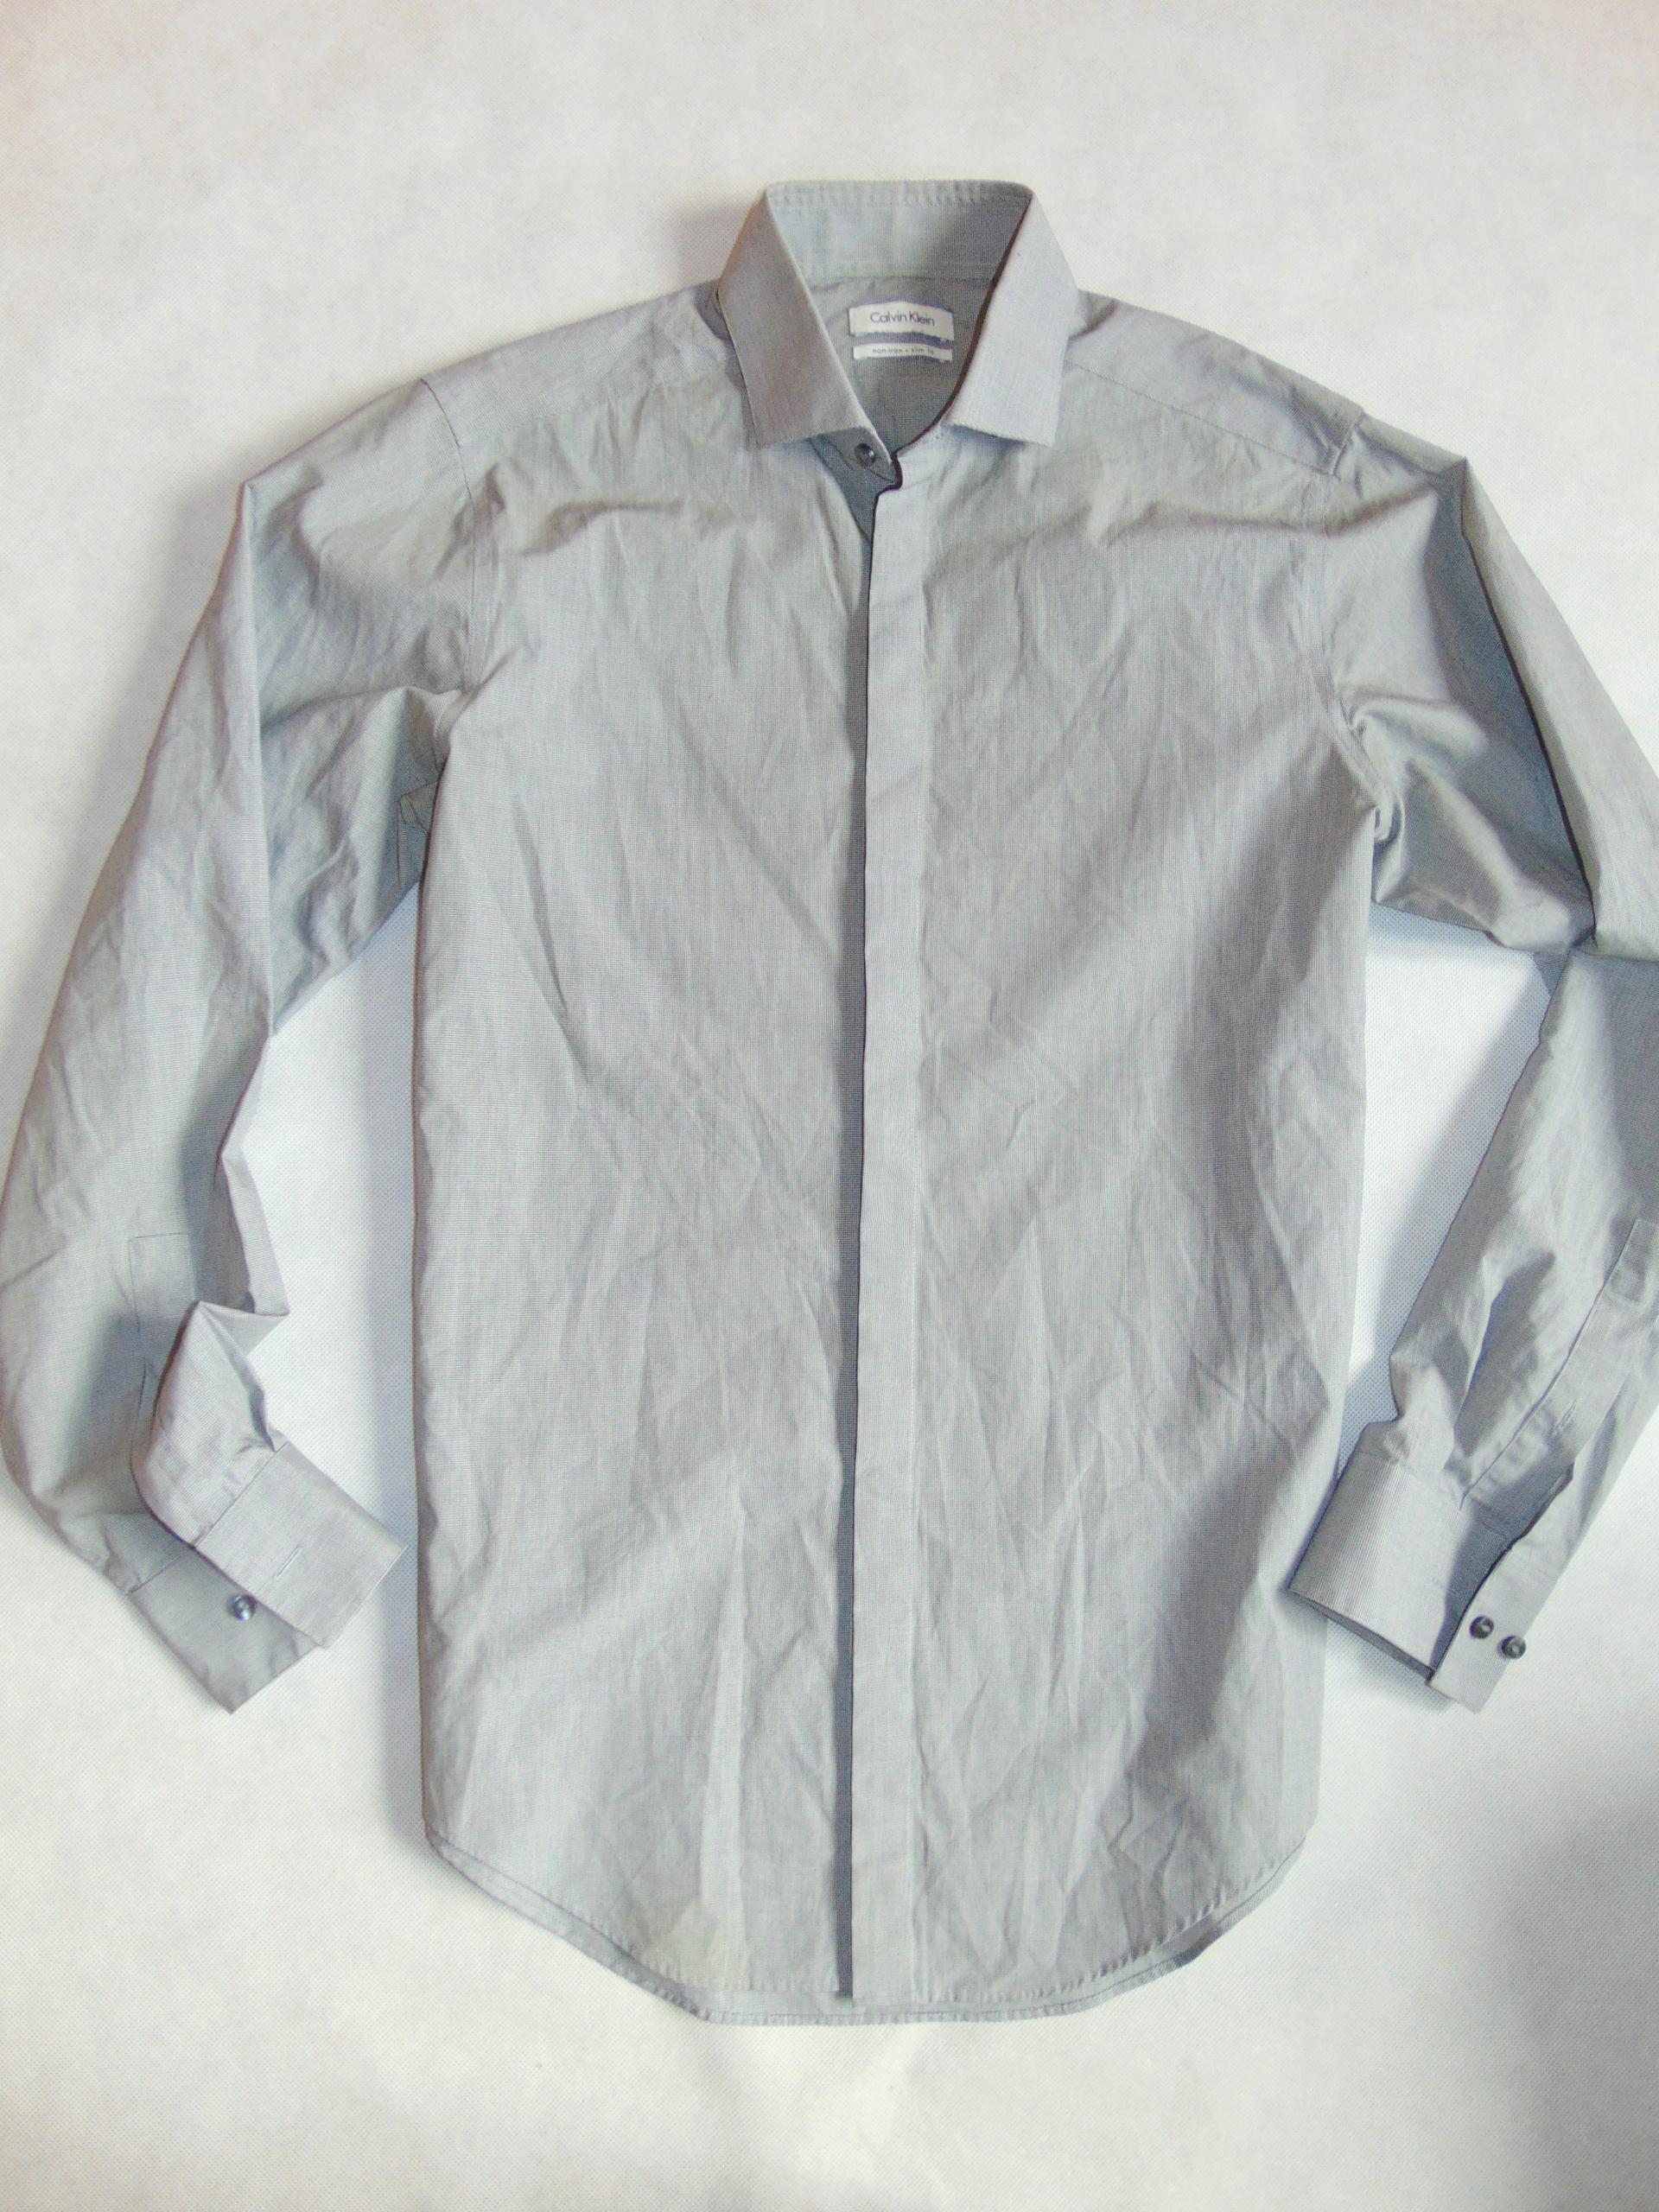 CALVIN KLEIN koszula męska KLASYK GREY r 34 / 35